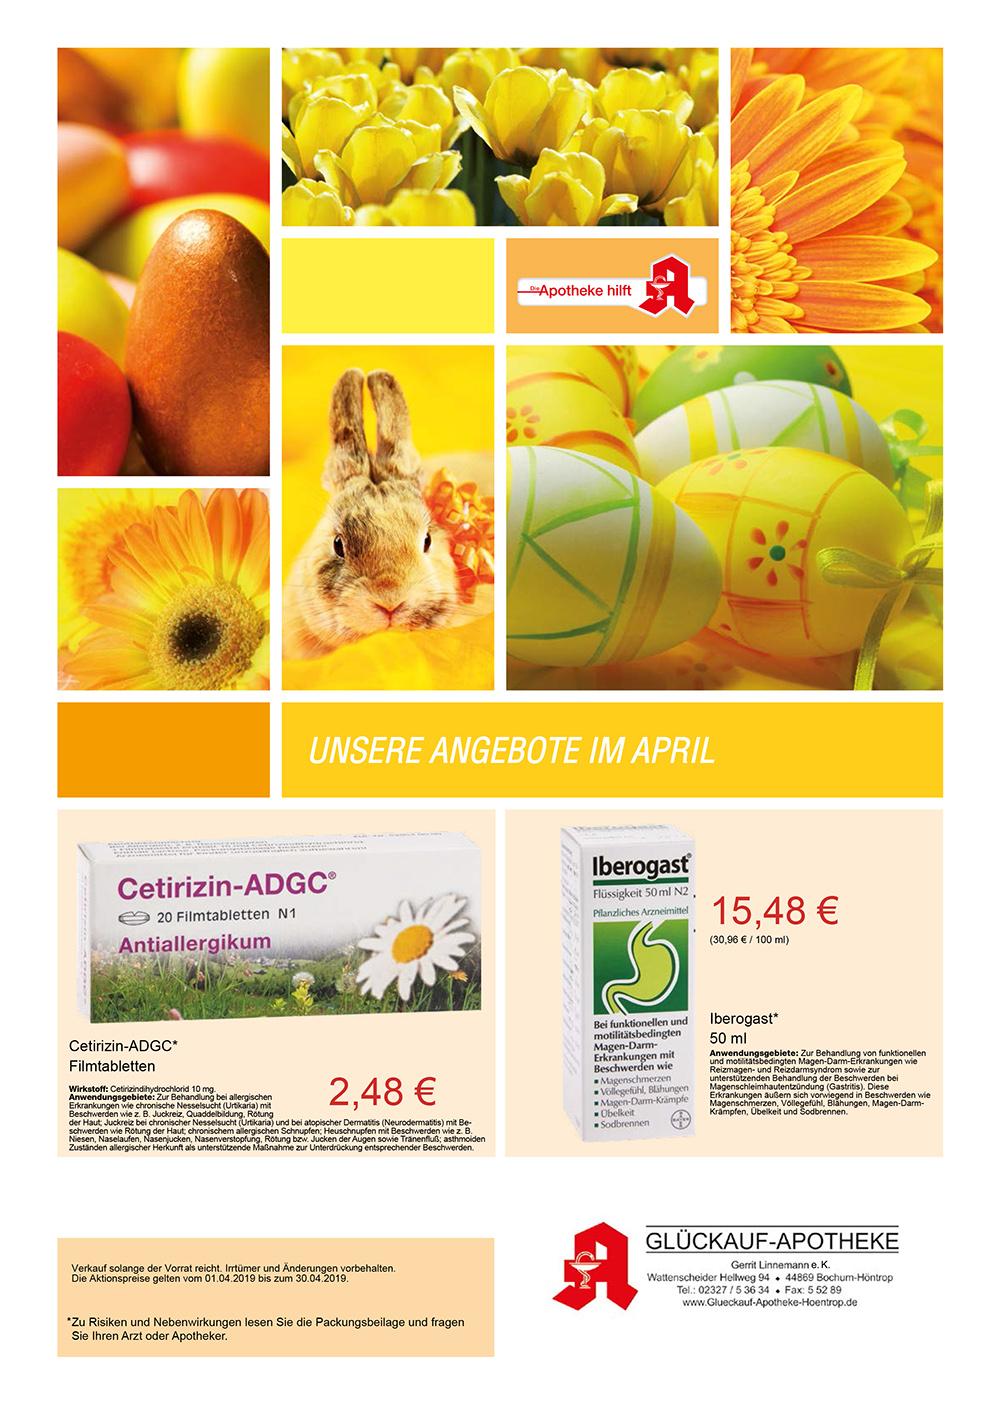 http://www.apotheken.de/fileadmin/clubarea/00000-Angebote/44869_16684_glueckauf_angebot_1.jpg